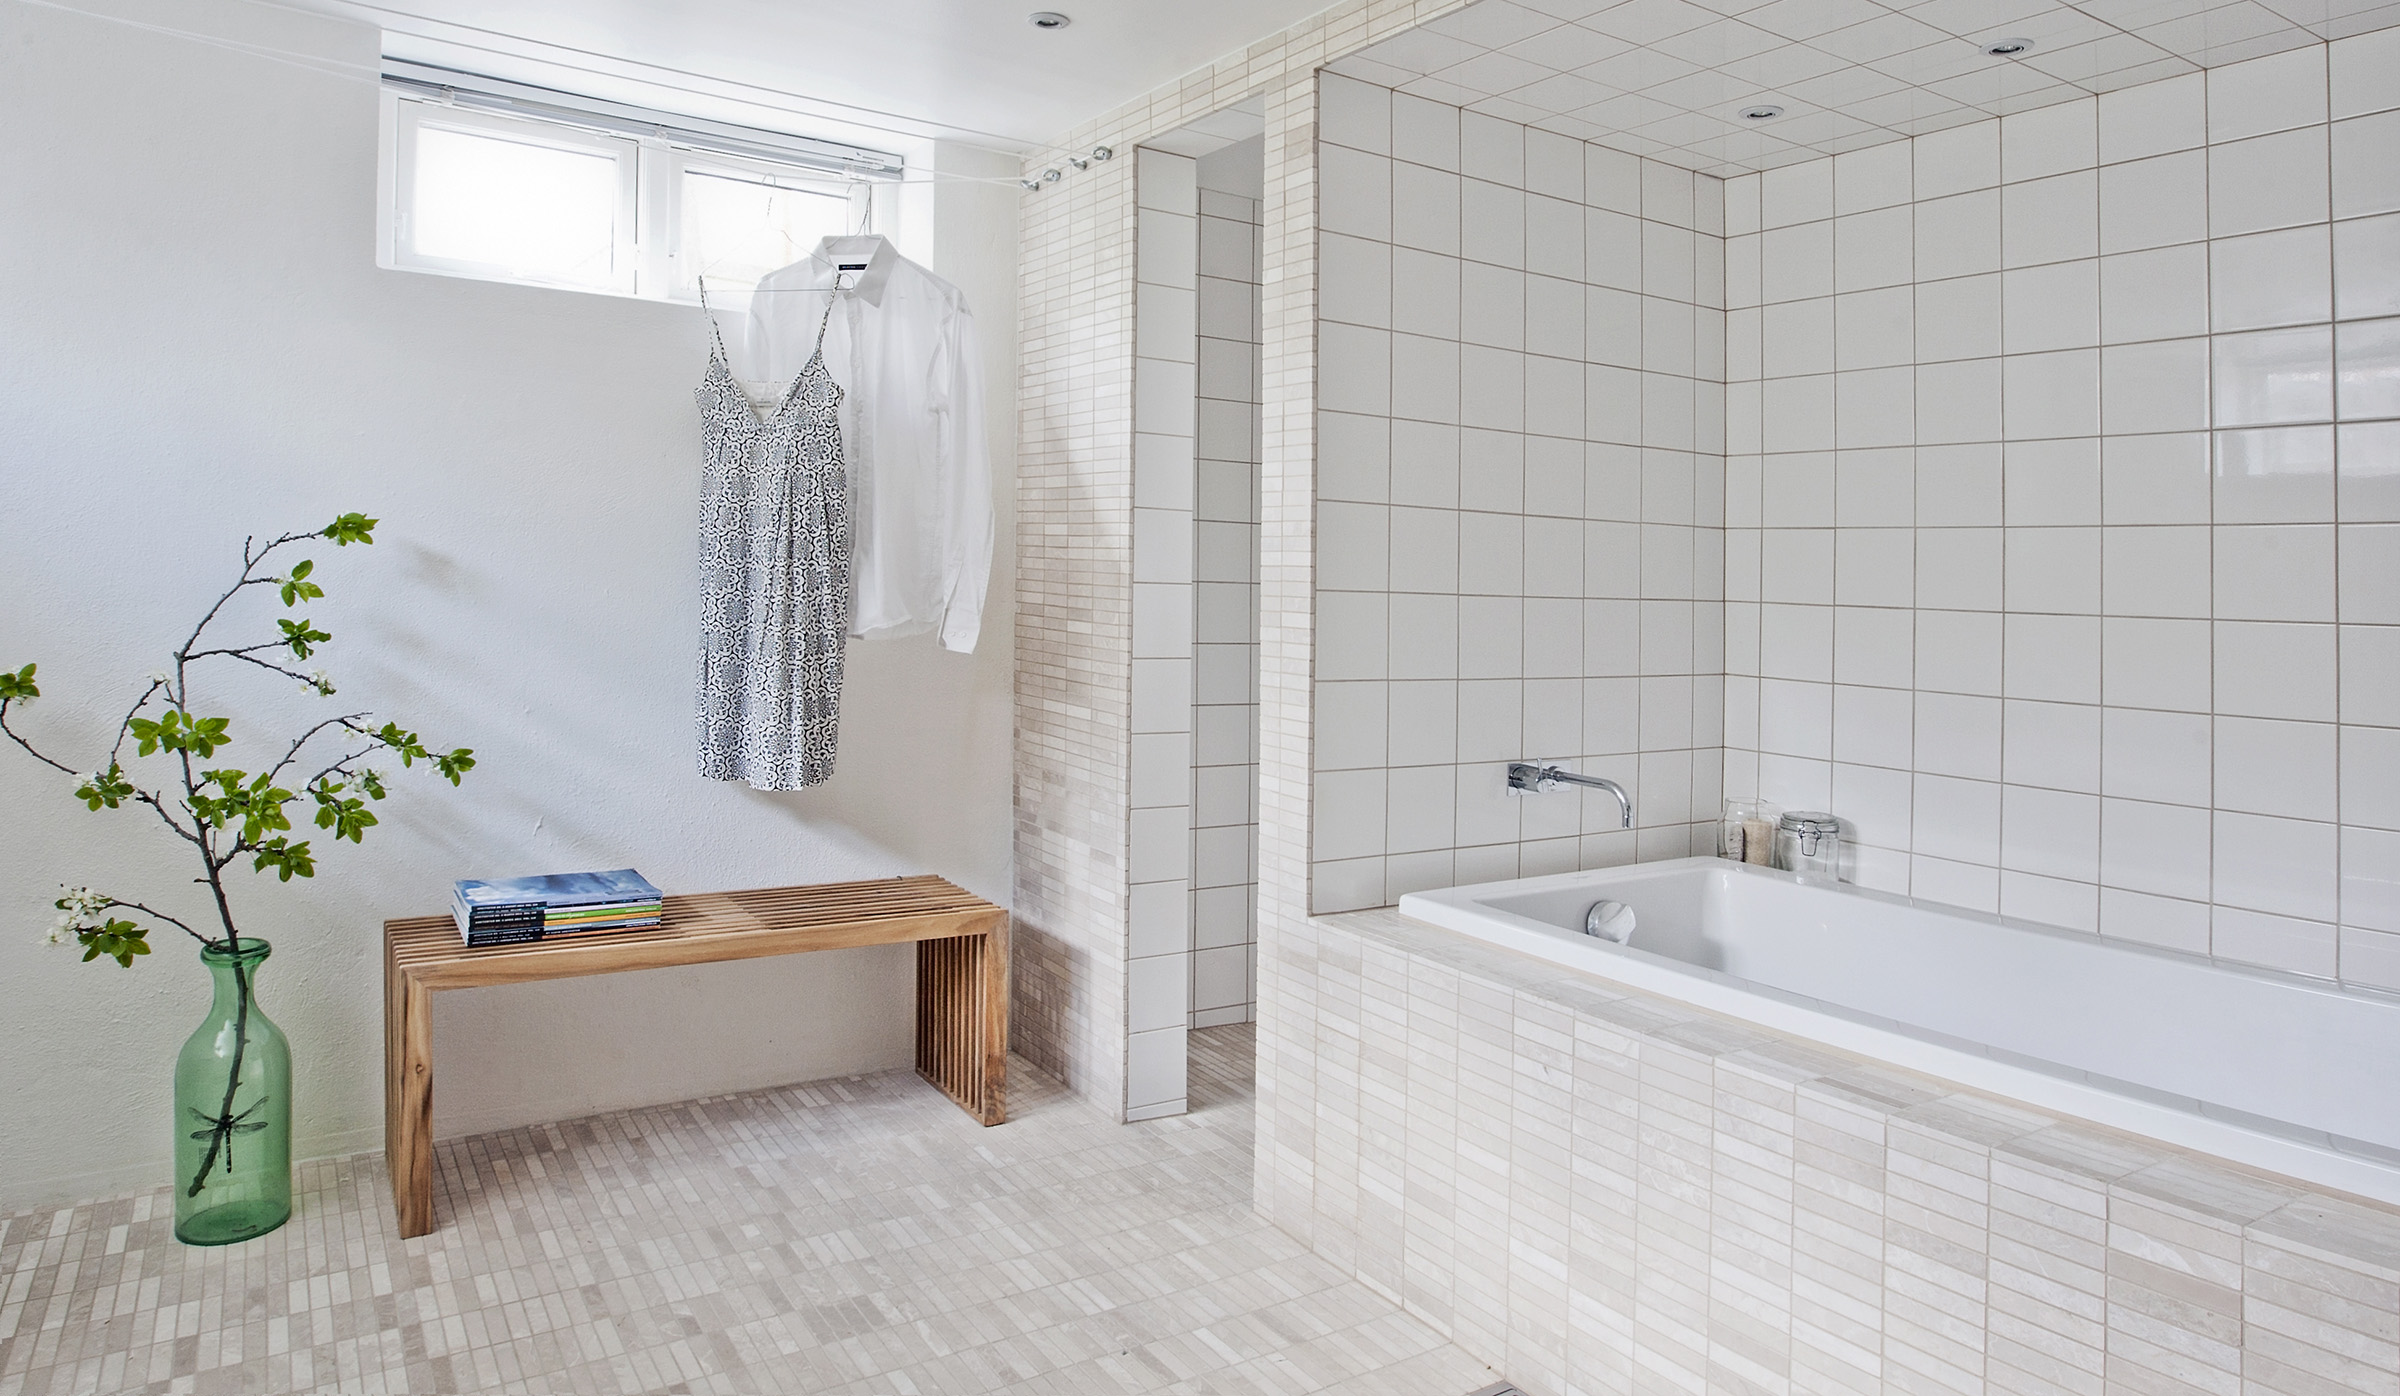 Arkitektens kælderbad - Danske Boligarkitekter